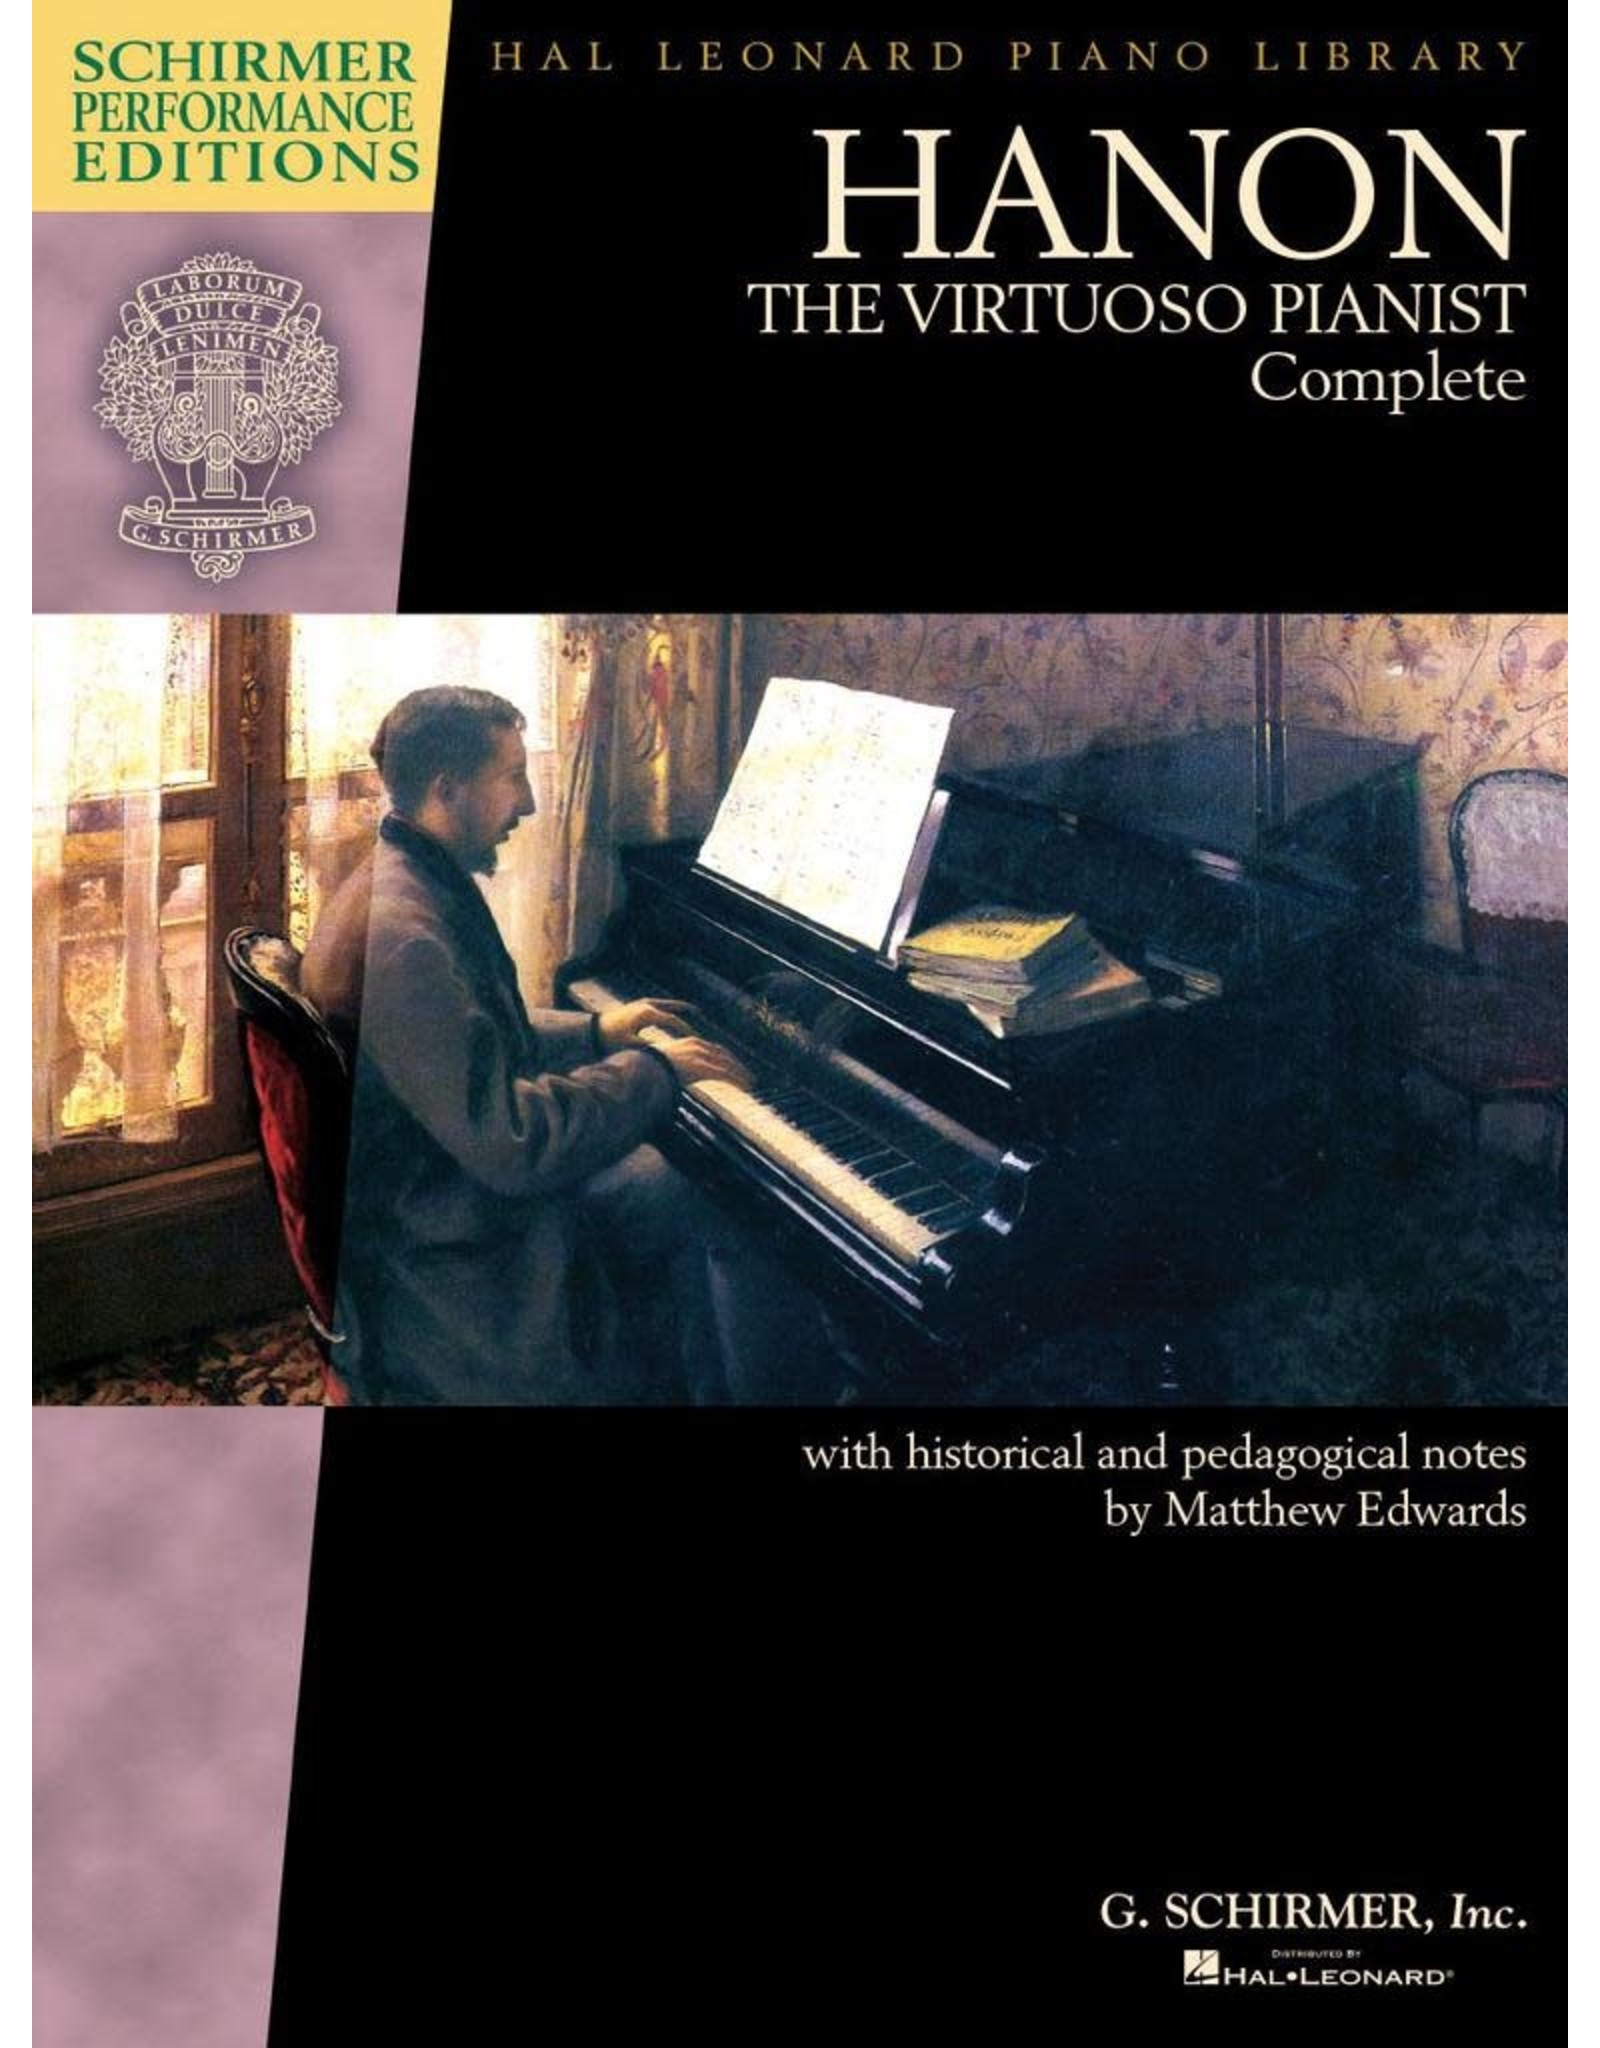 Hal Leonard Hanon - The Virtuoso Pianist Complete - Schirmer Performance Edition